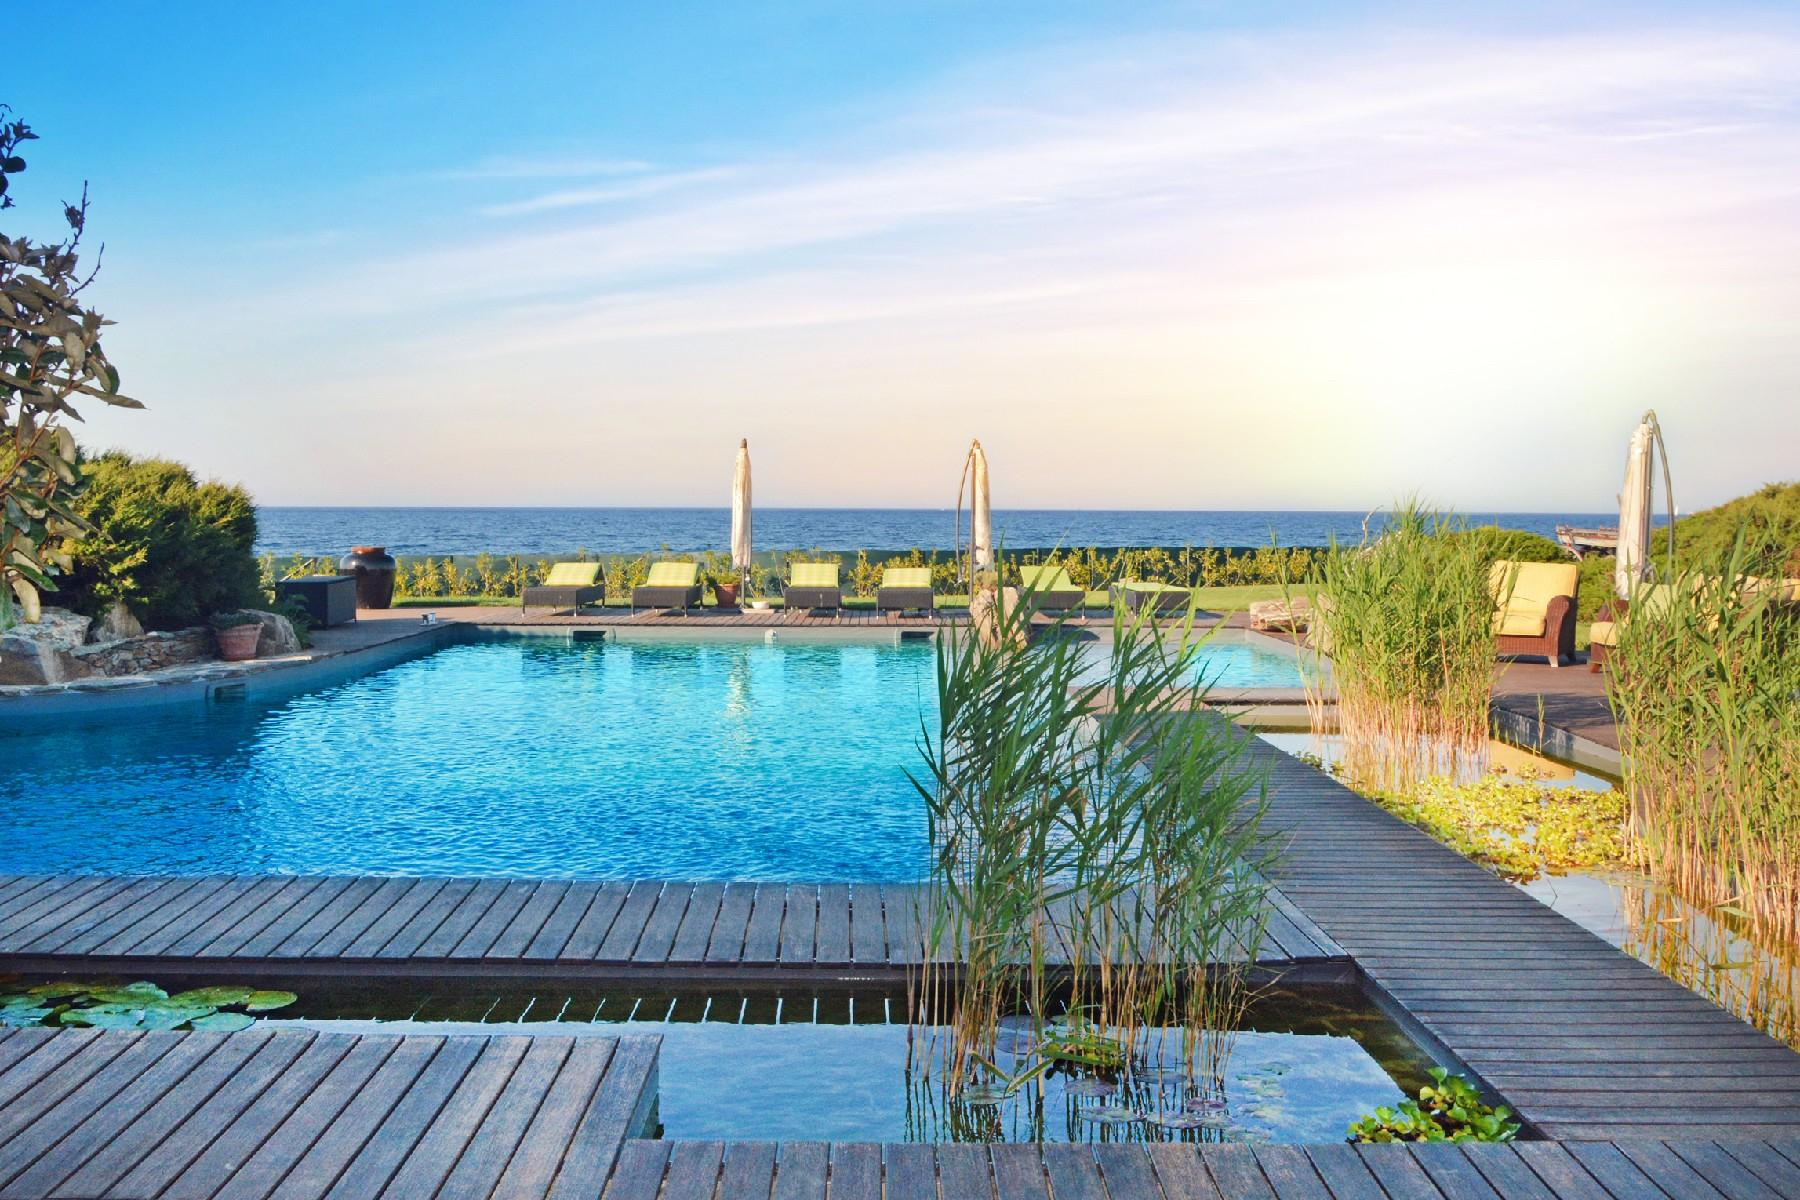 Pieds-dans-l'eau Villa auf einer privaten Halbinsel - 5